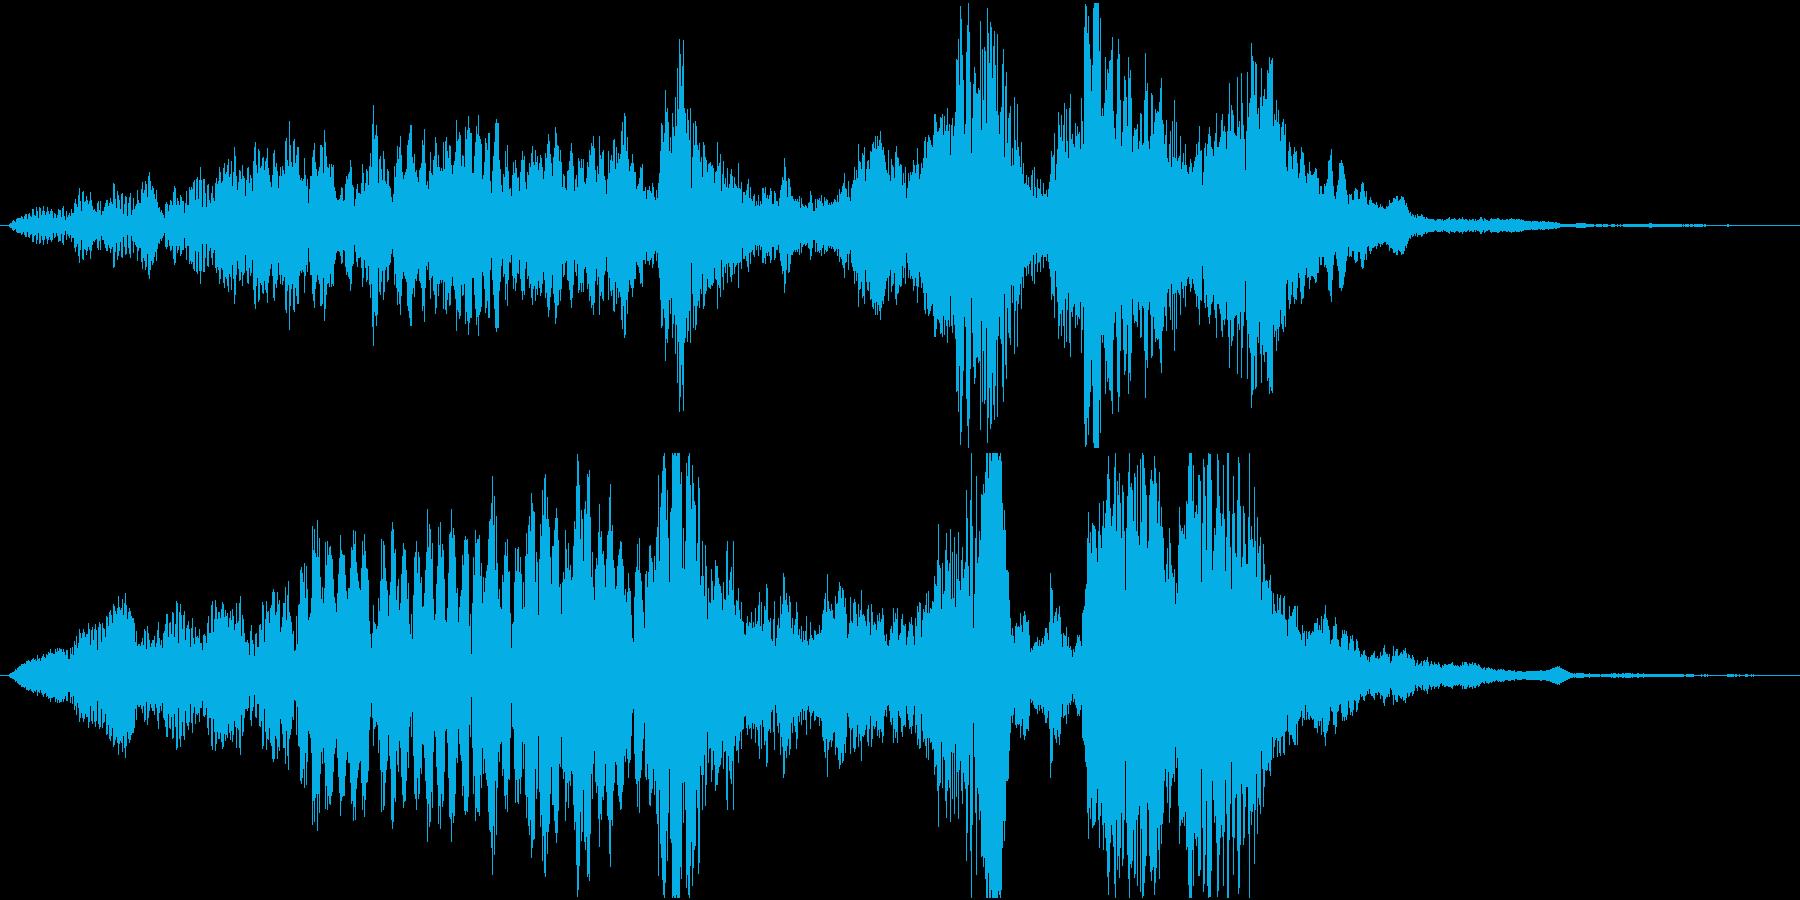 【SE 効果音】不気味な音8の再生済みの波形